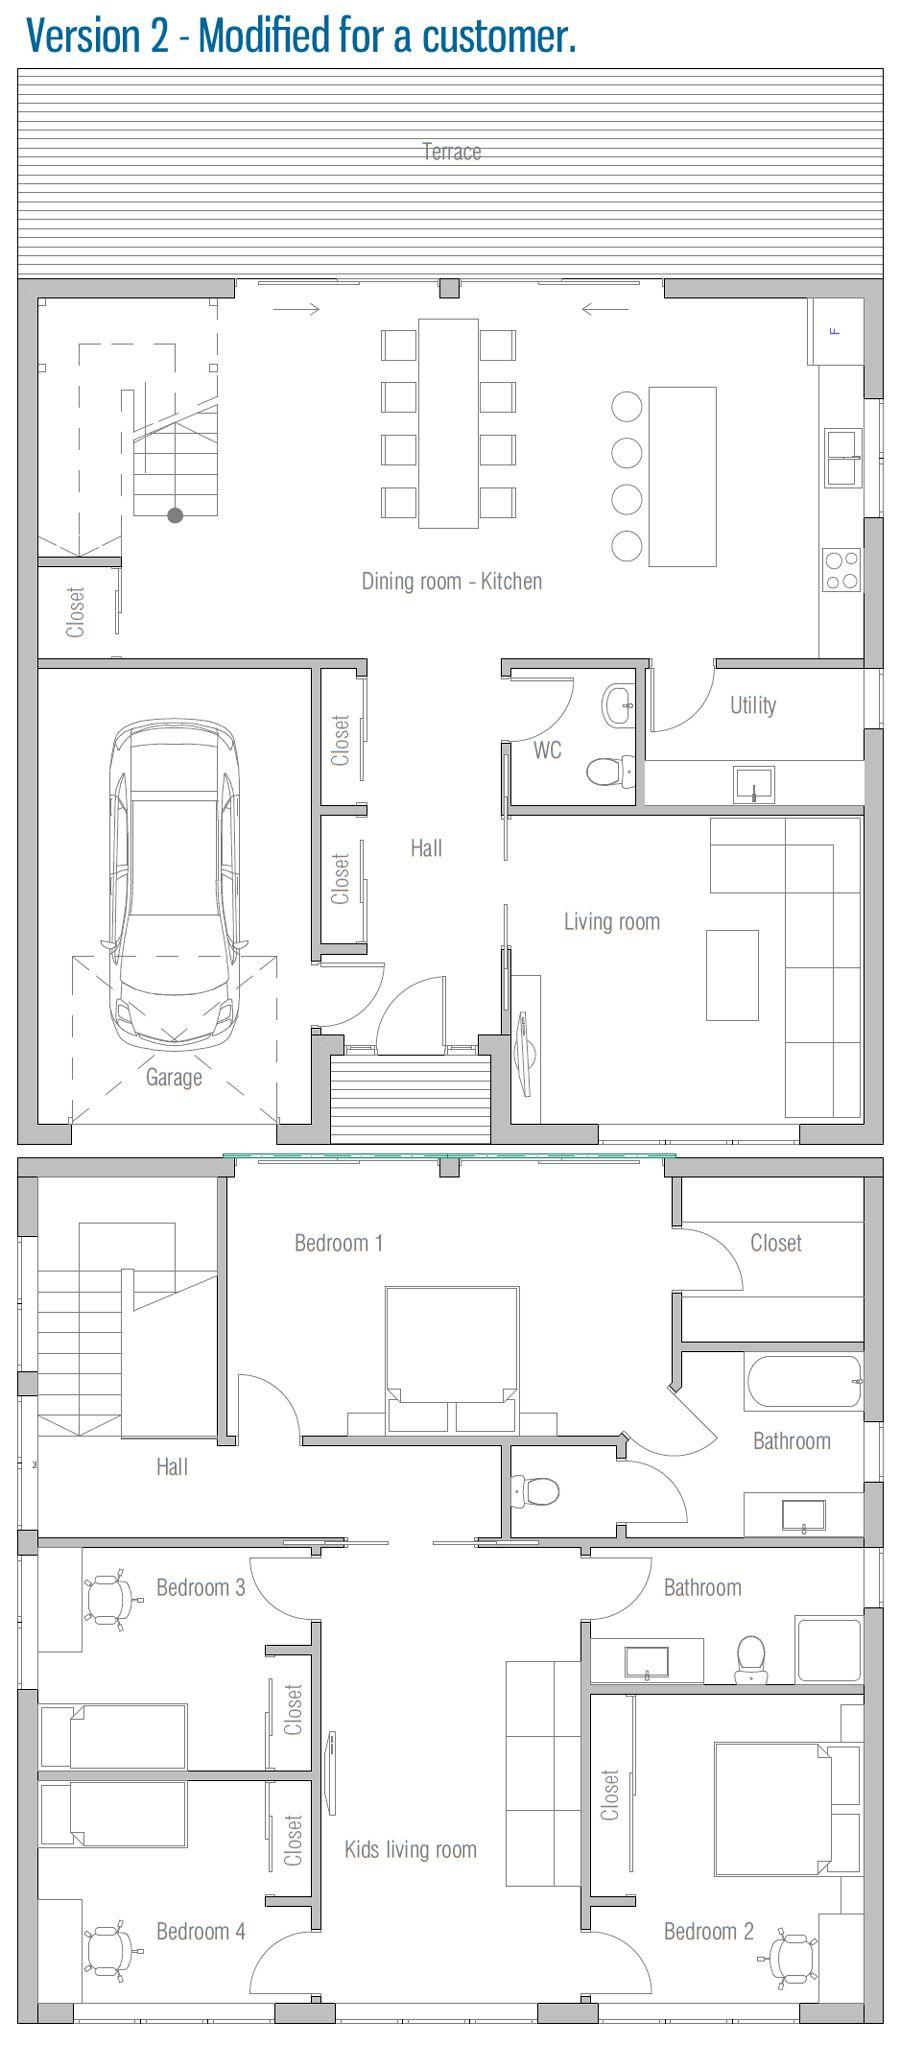 Customer House Plan My House Plans House Plans Craftsman Floor